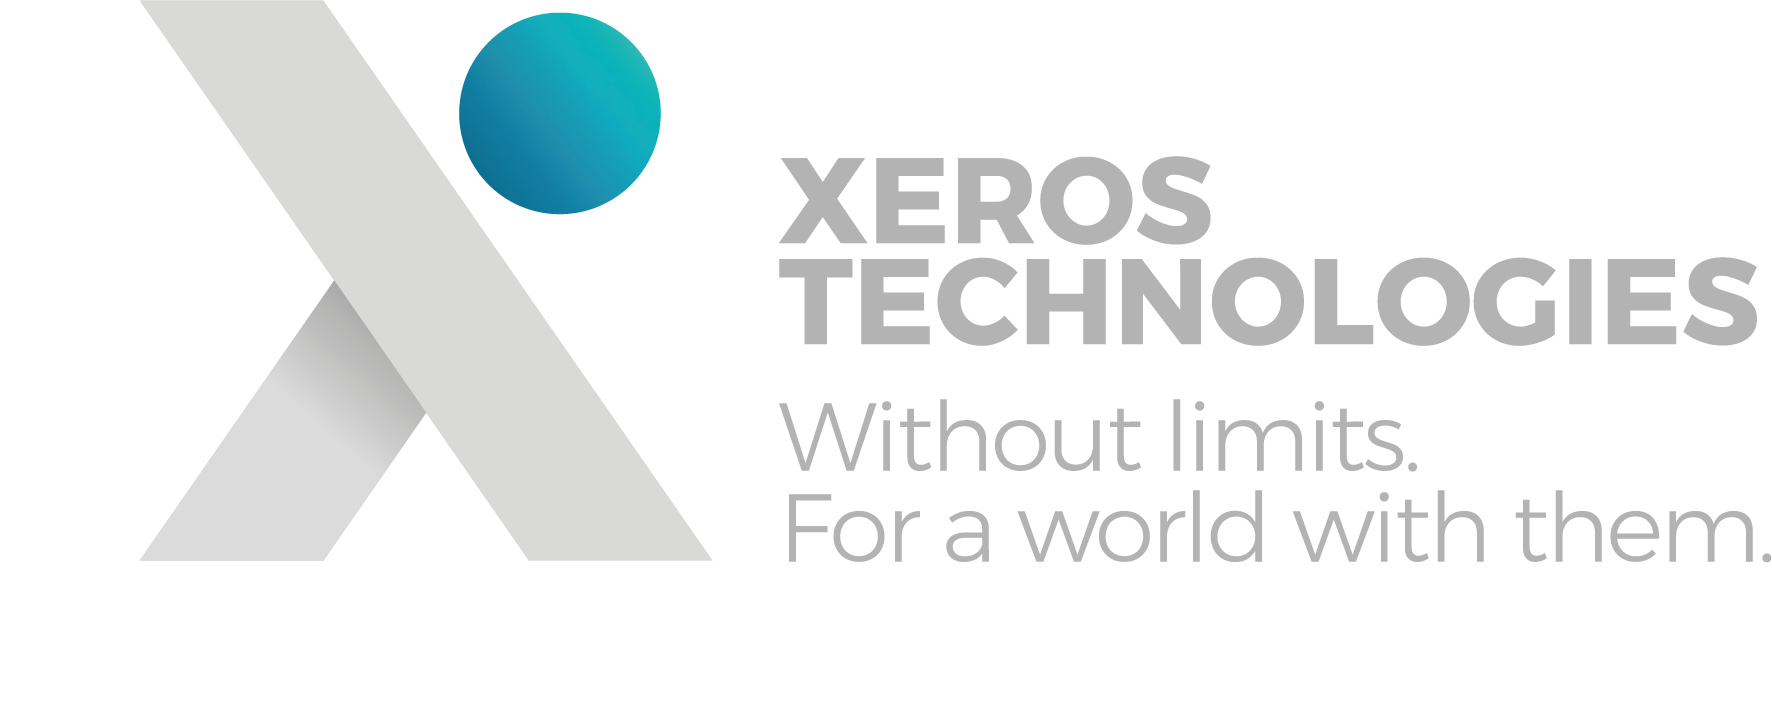 Xeros technologies_with_strap